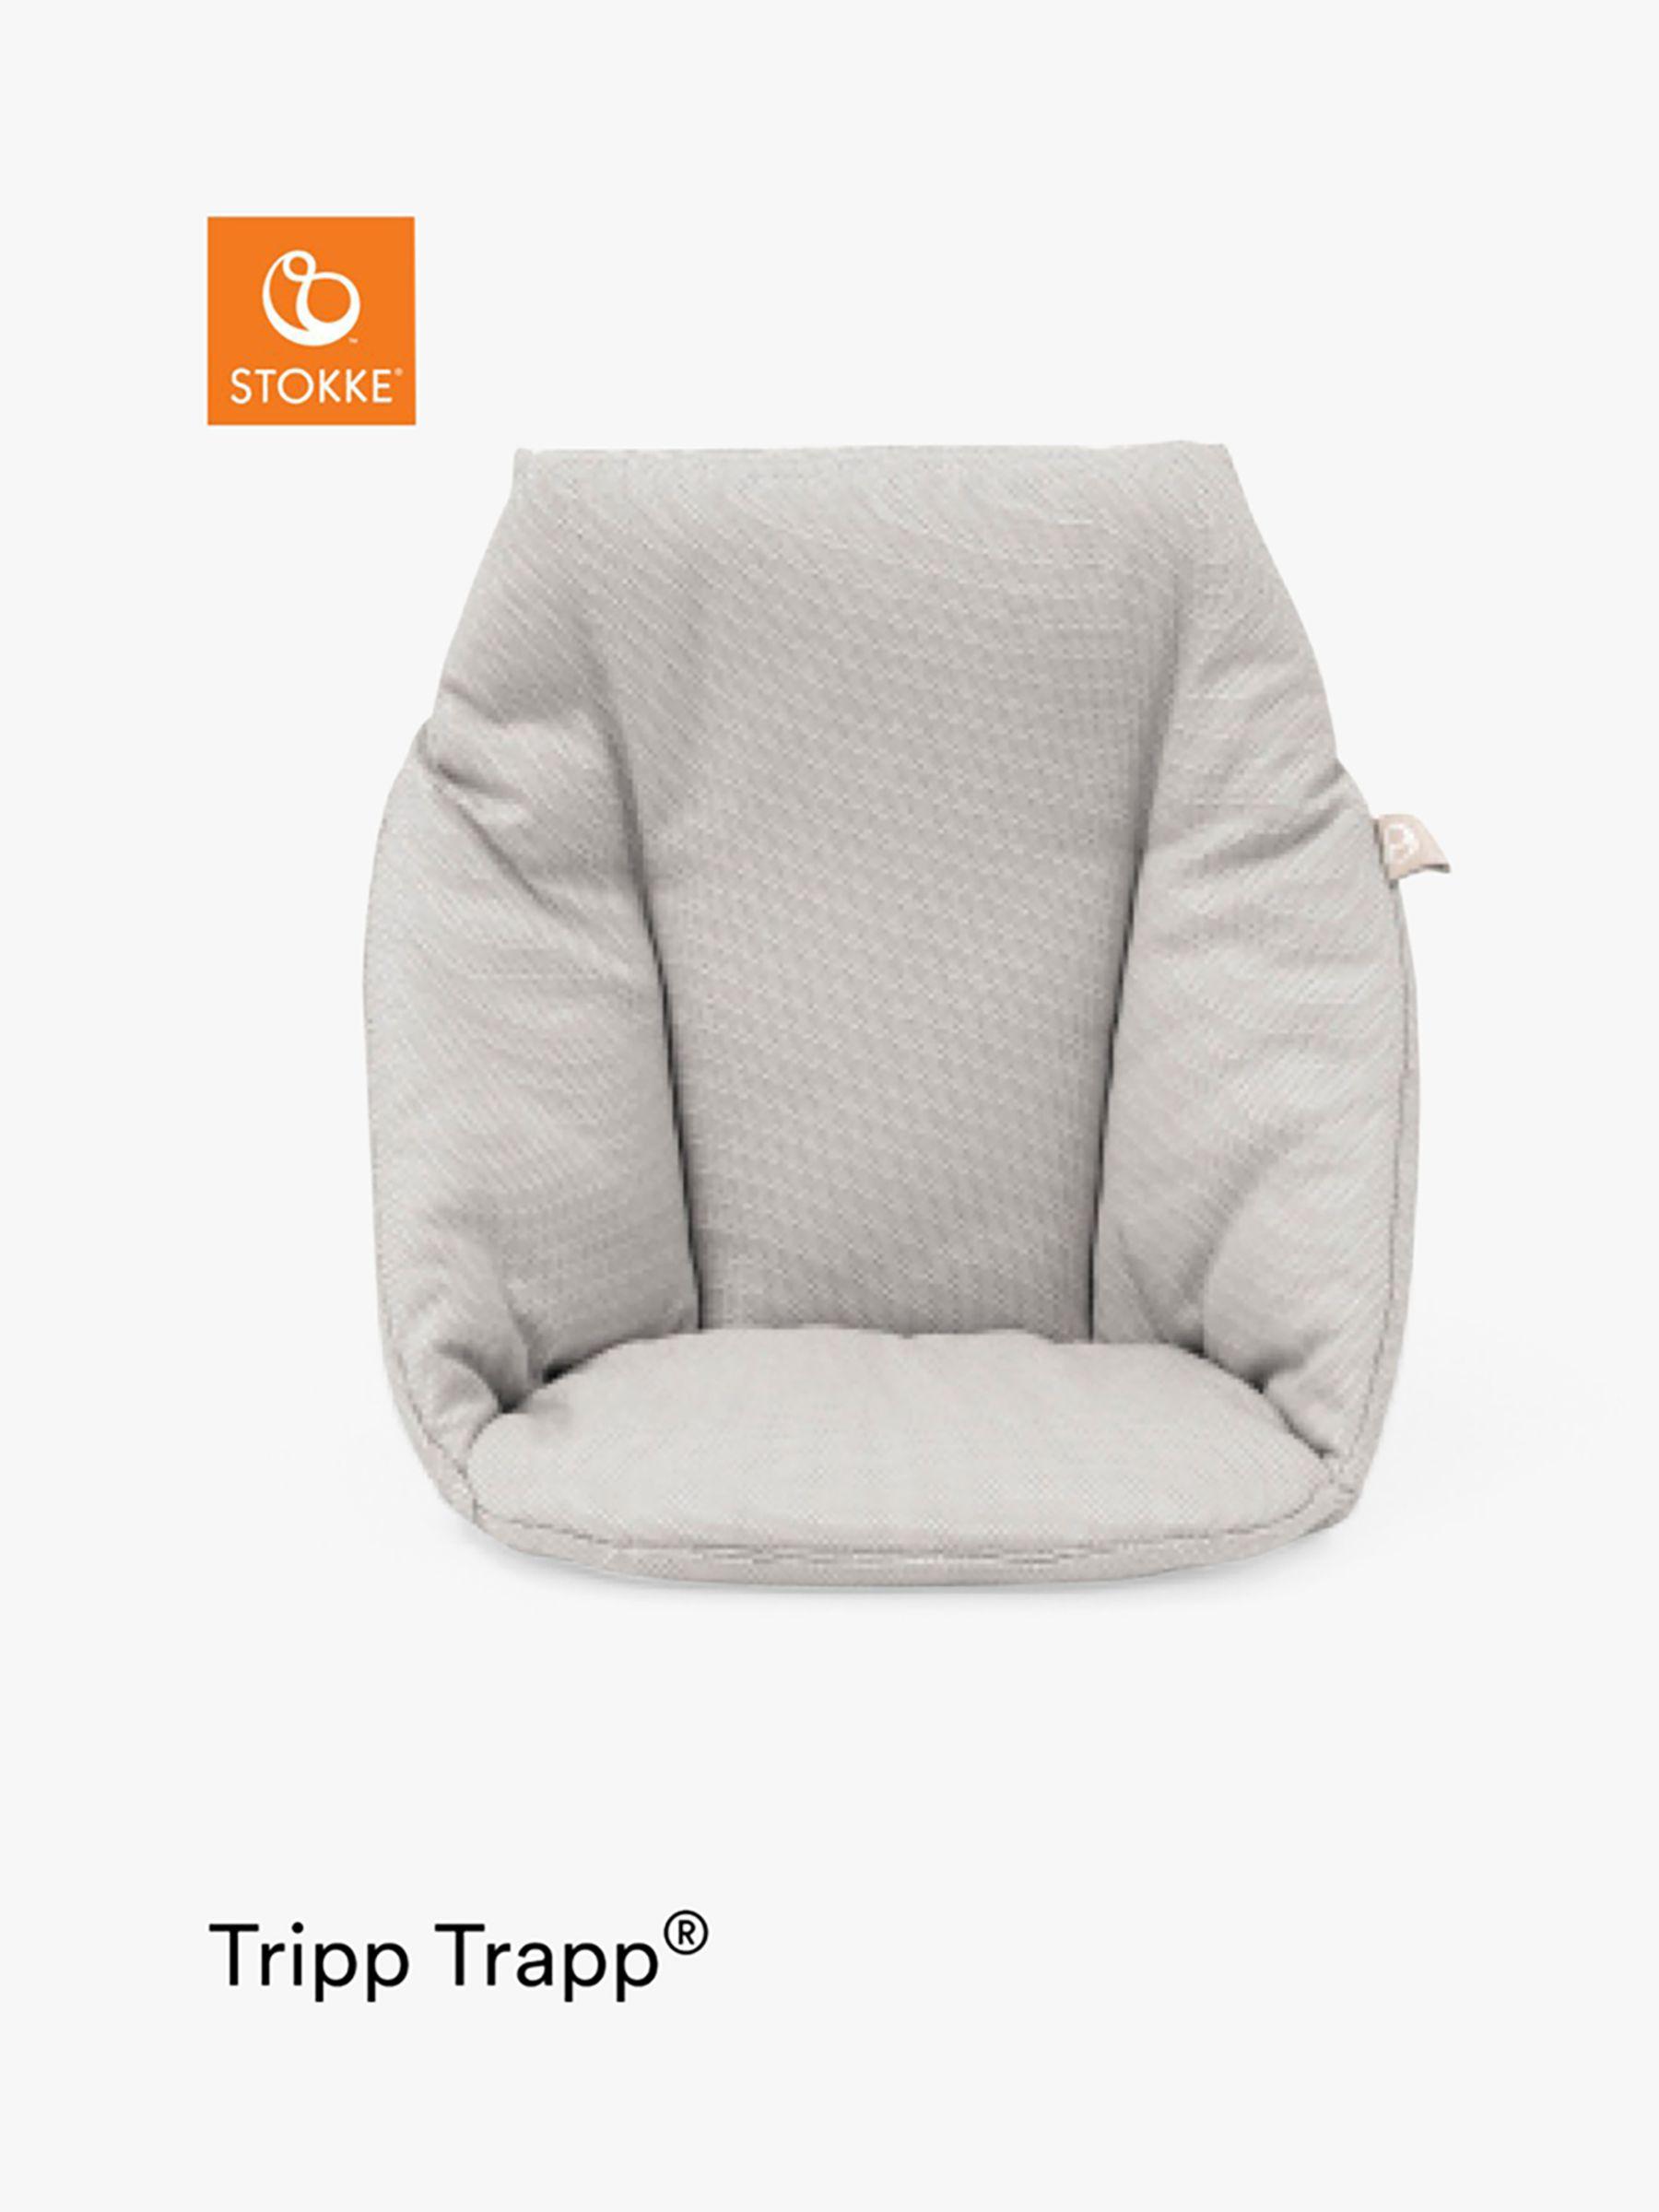 Stokke Tripp Trapp Baby Highchair Cushion, Timeless Grey